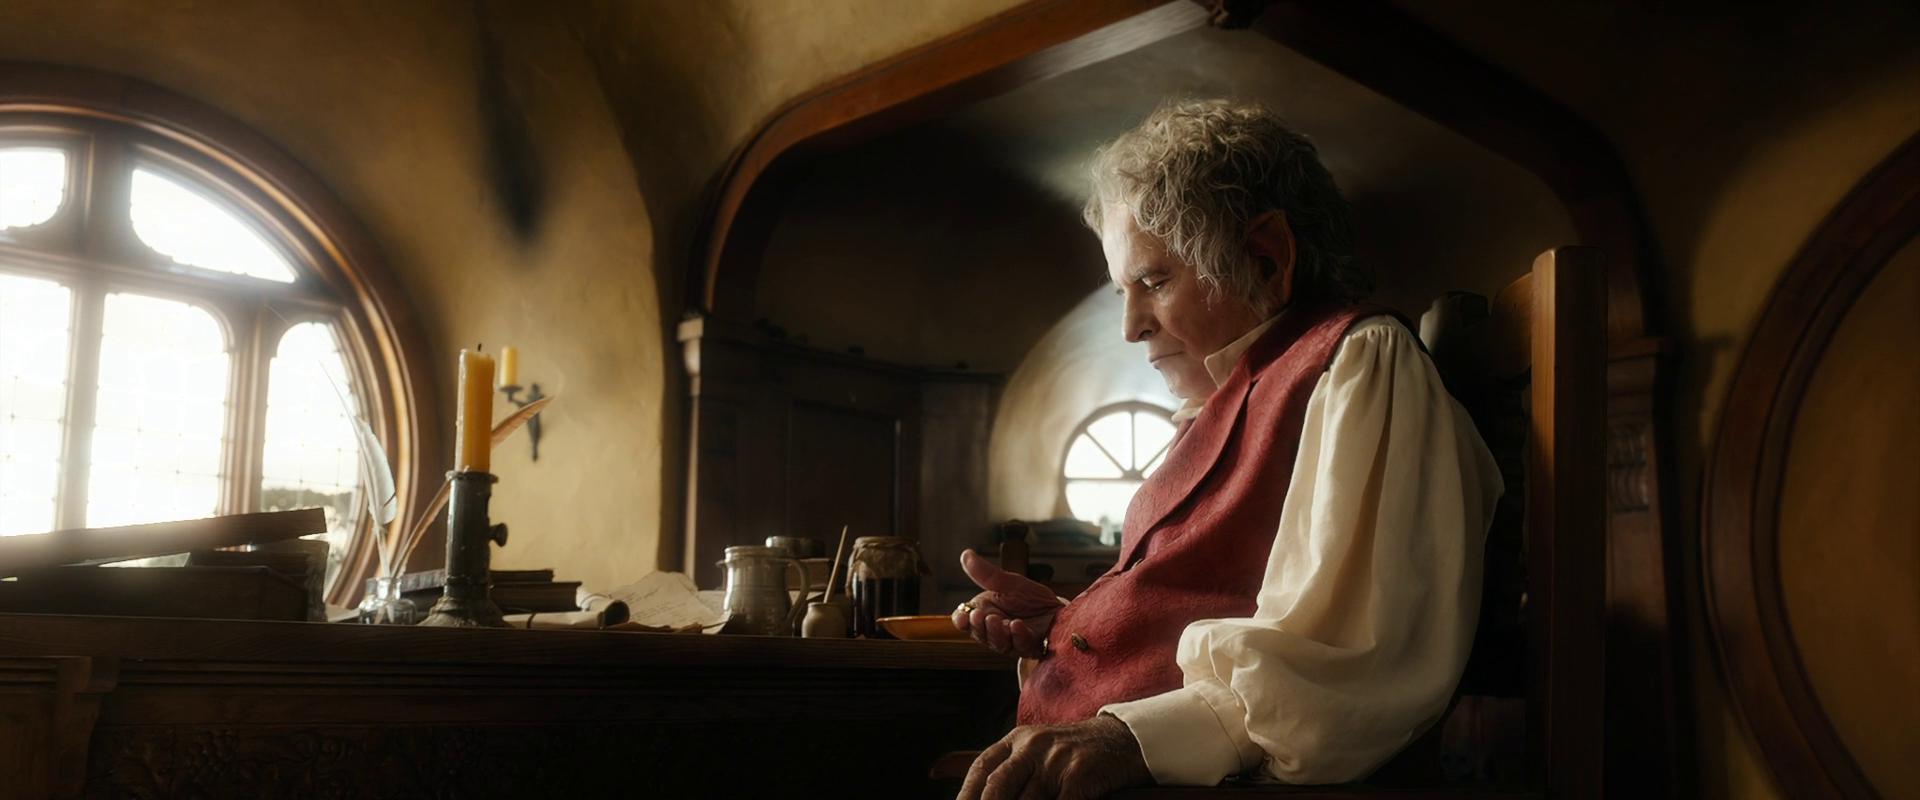 Хоббит: Битва пяти воинств / The Hobbit: The Battle of the Five Armies (2014) BDRip 1080p | Лицензия